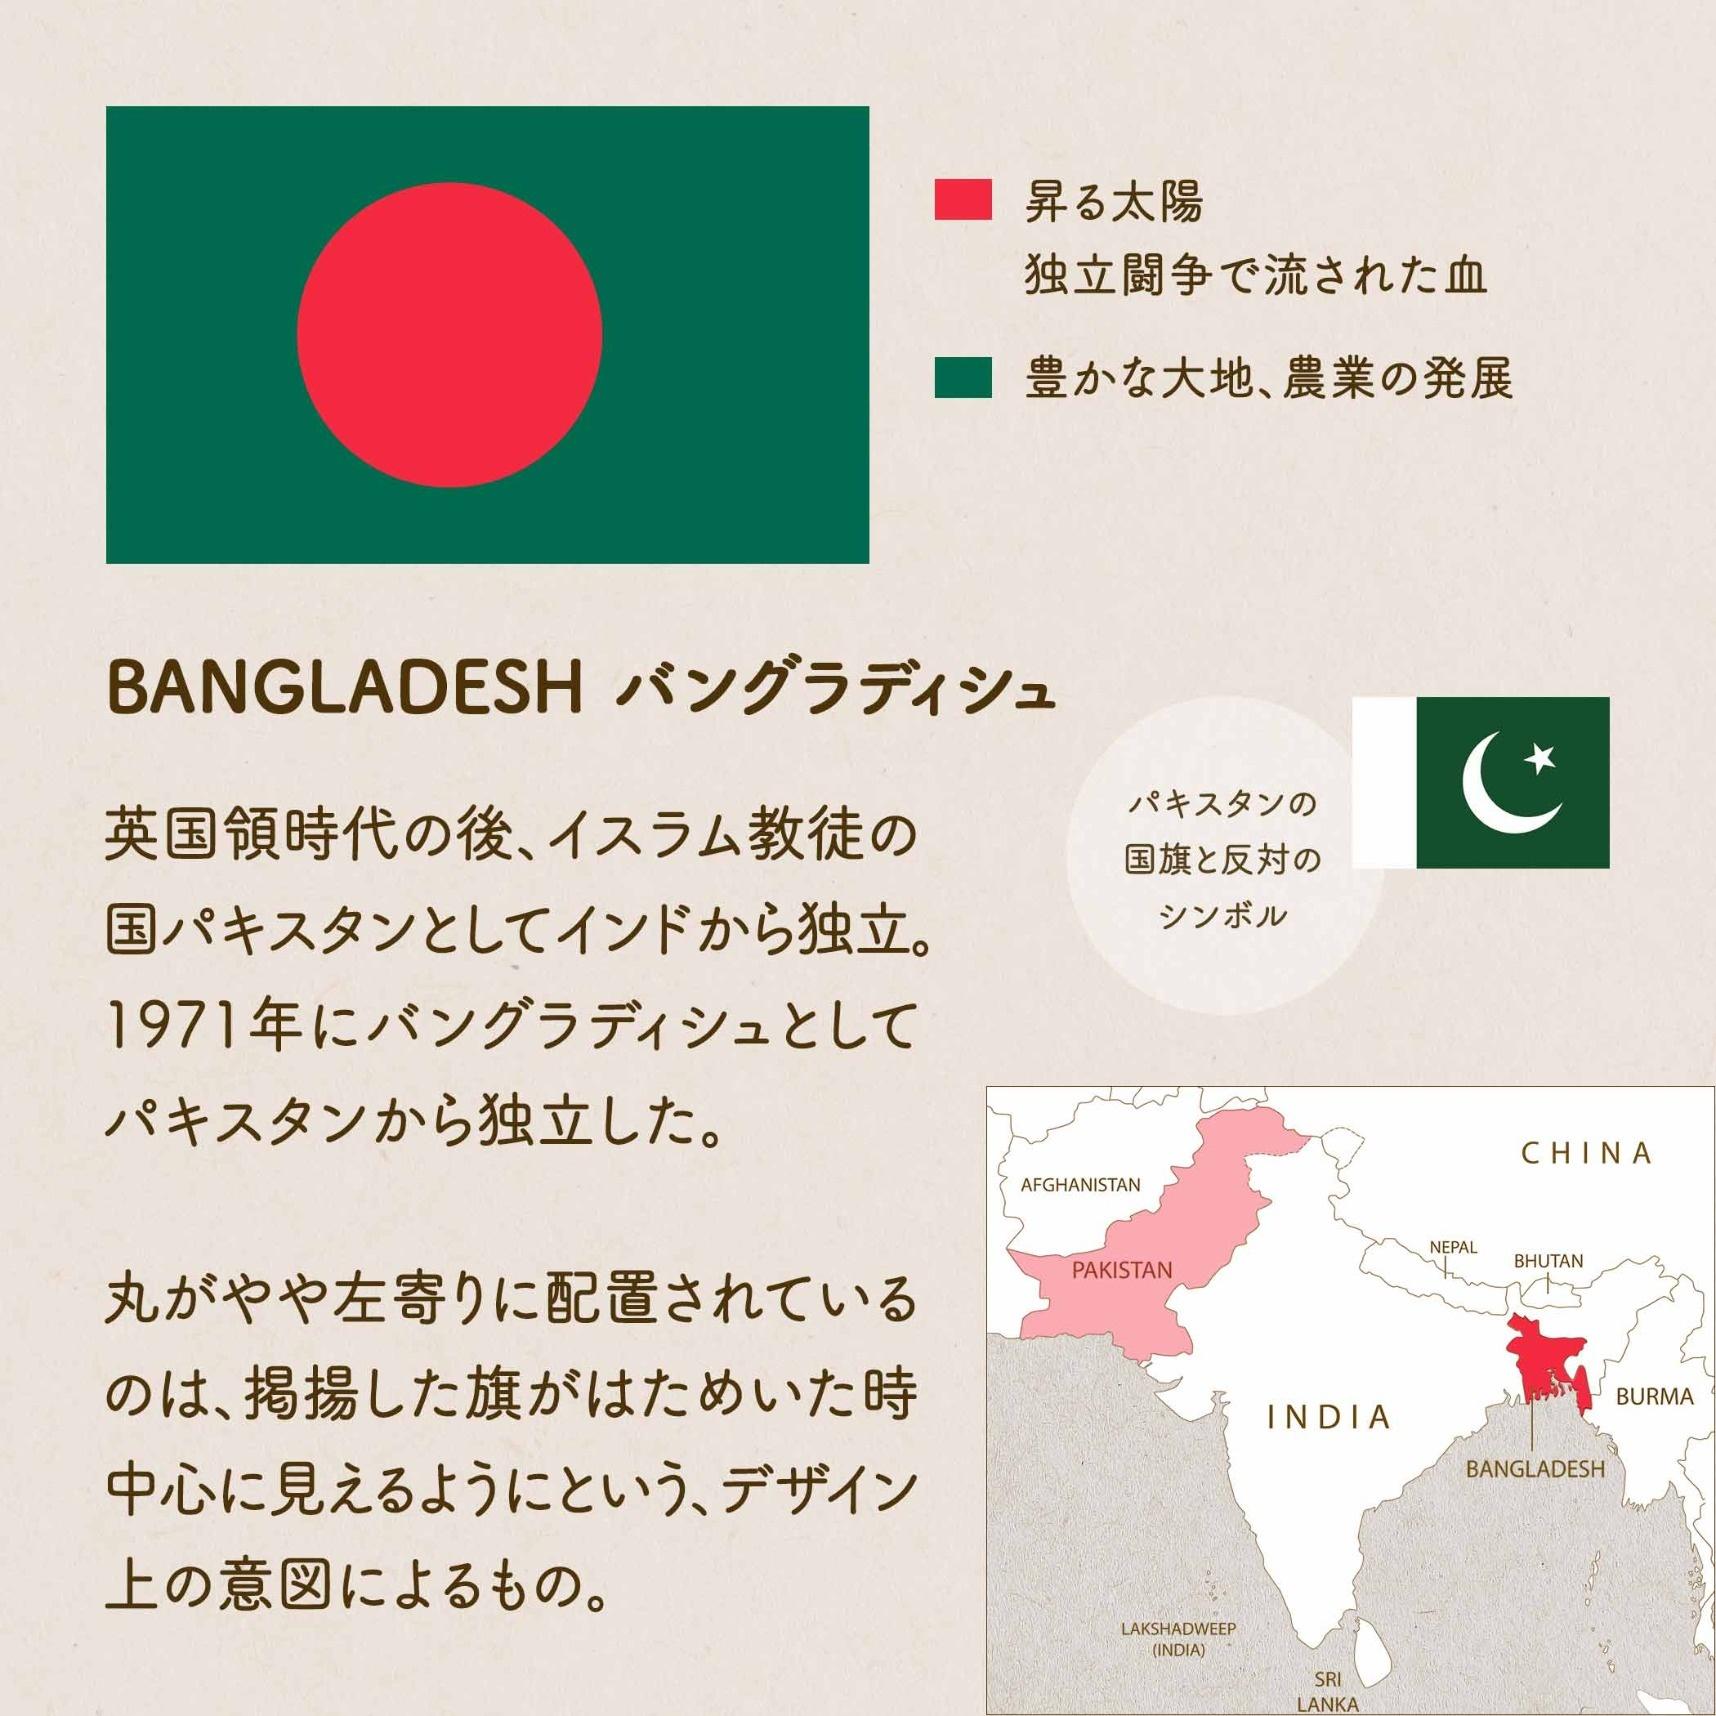 BANGLADESH バングラディシュ/英国領時代の後、イスラム教徒の国パキスタンとしてインドから独立。1971年にバングラディシュとしてパキスタンから独立した。丸がやや左寄りに配置されているのは、掲揚した旗がはためいた時中心に見えるようにという、デザイン上の意図によるもの。赤=昇る太陽・独立闘争で流された血  緑=豊かな大地、農業の発展 パキスタンの国旗と反対のシンボル